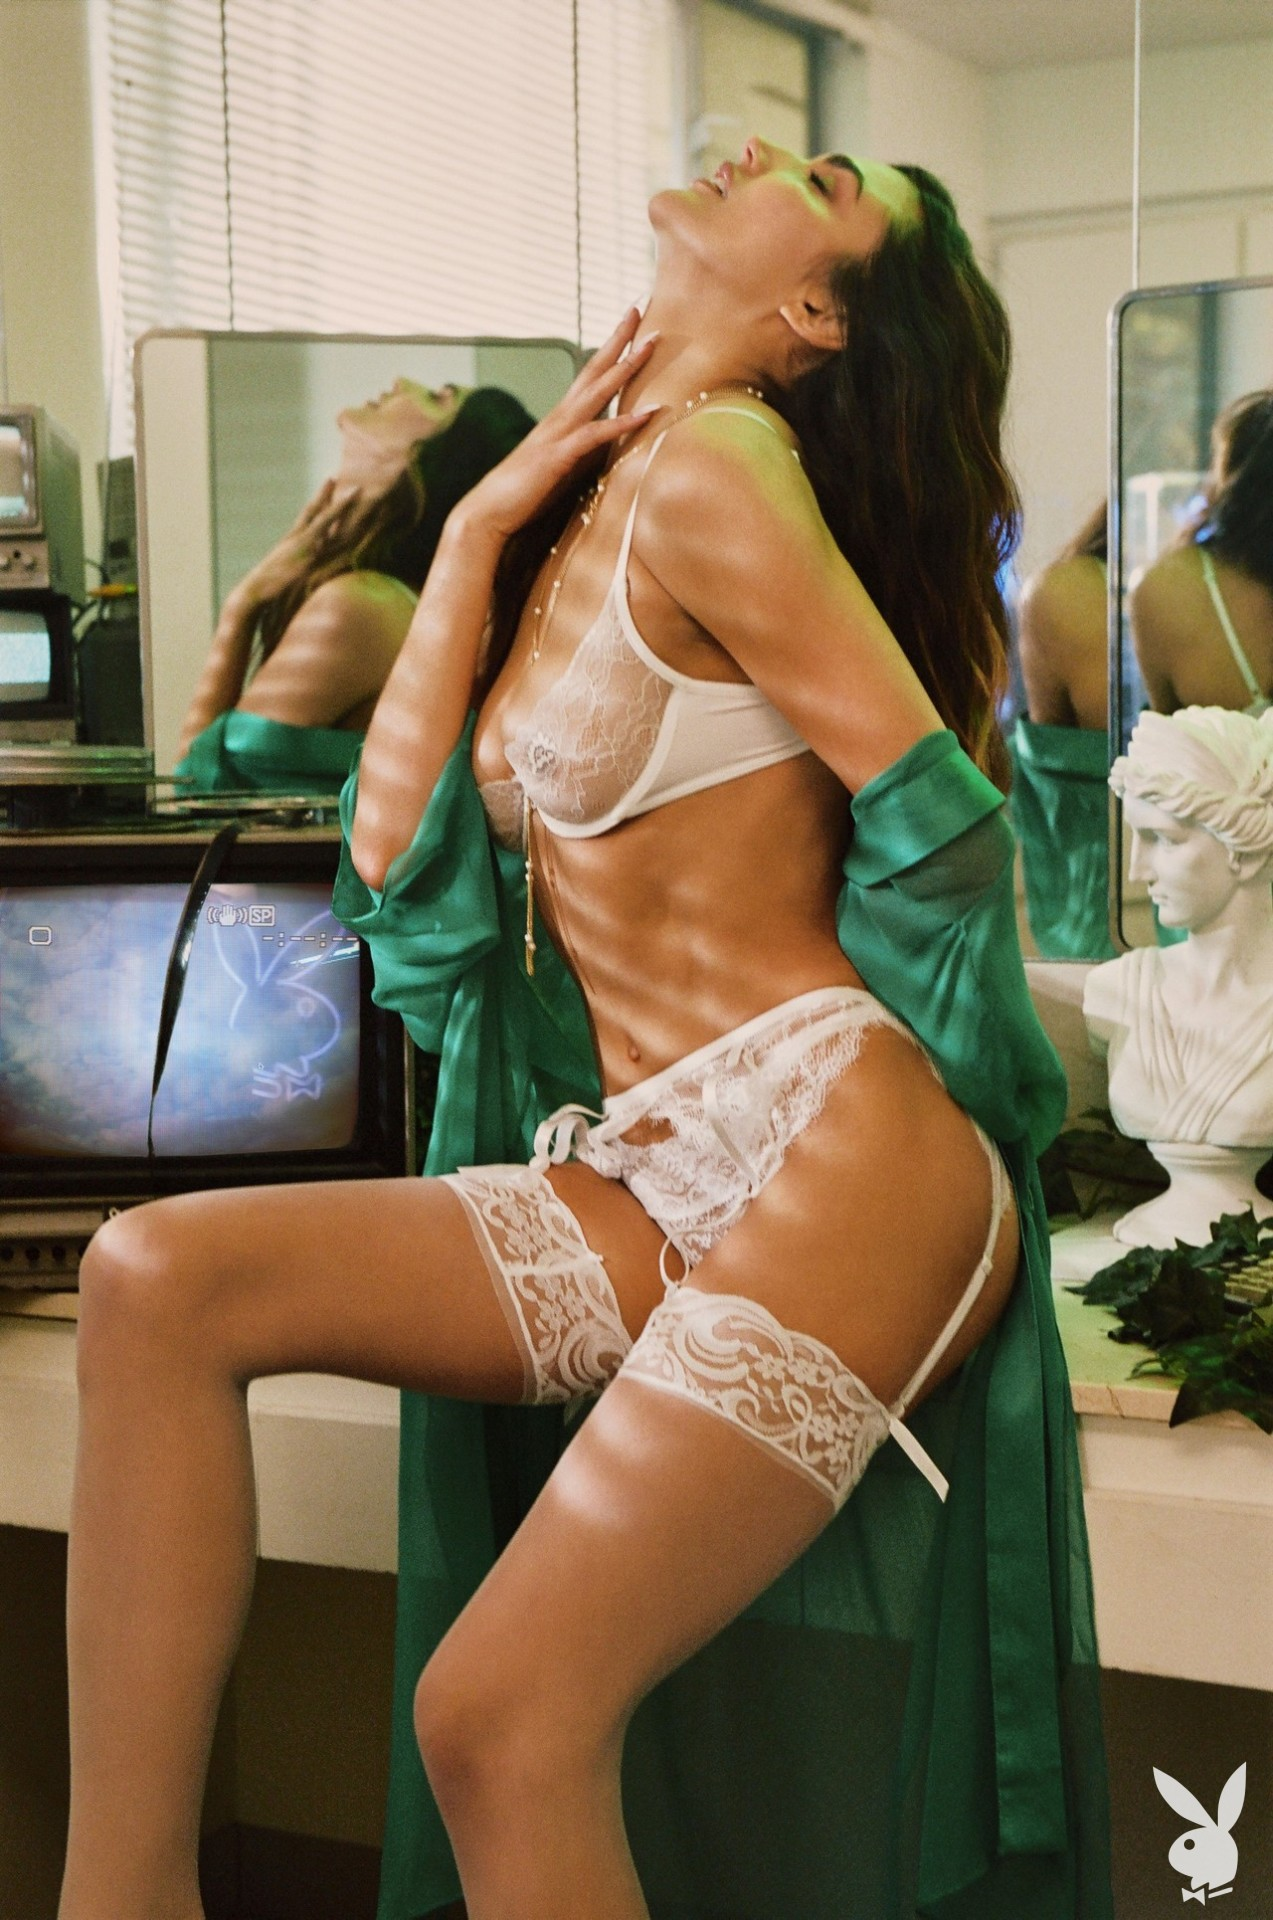 Hailee Lautenbach Playmate Outtakes Playboy Plus 0001